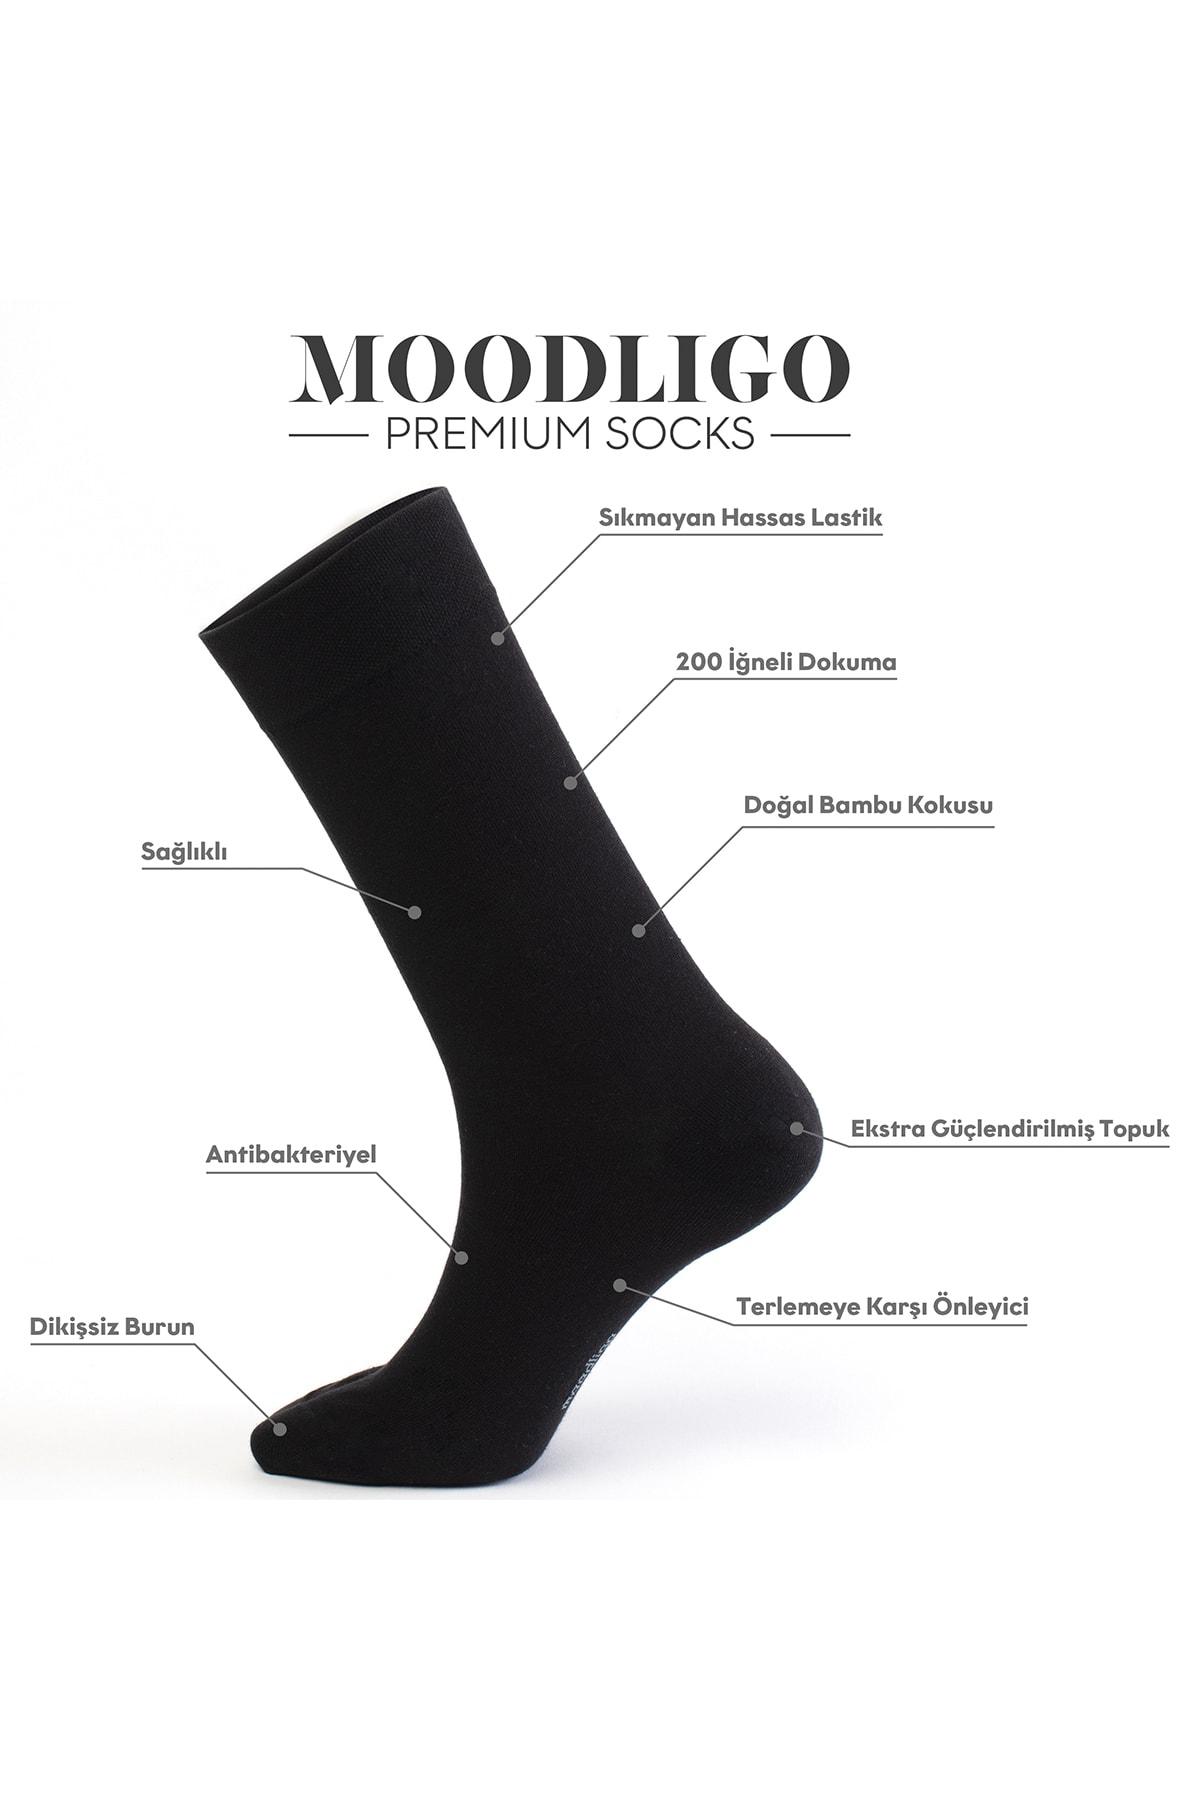 Moodligo Premium 6'lı Erkek Bambu Çorap - 3 Siyah 3Lacivert 2